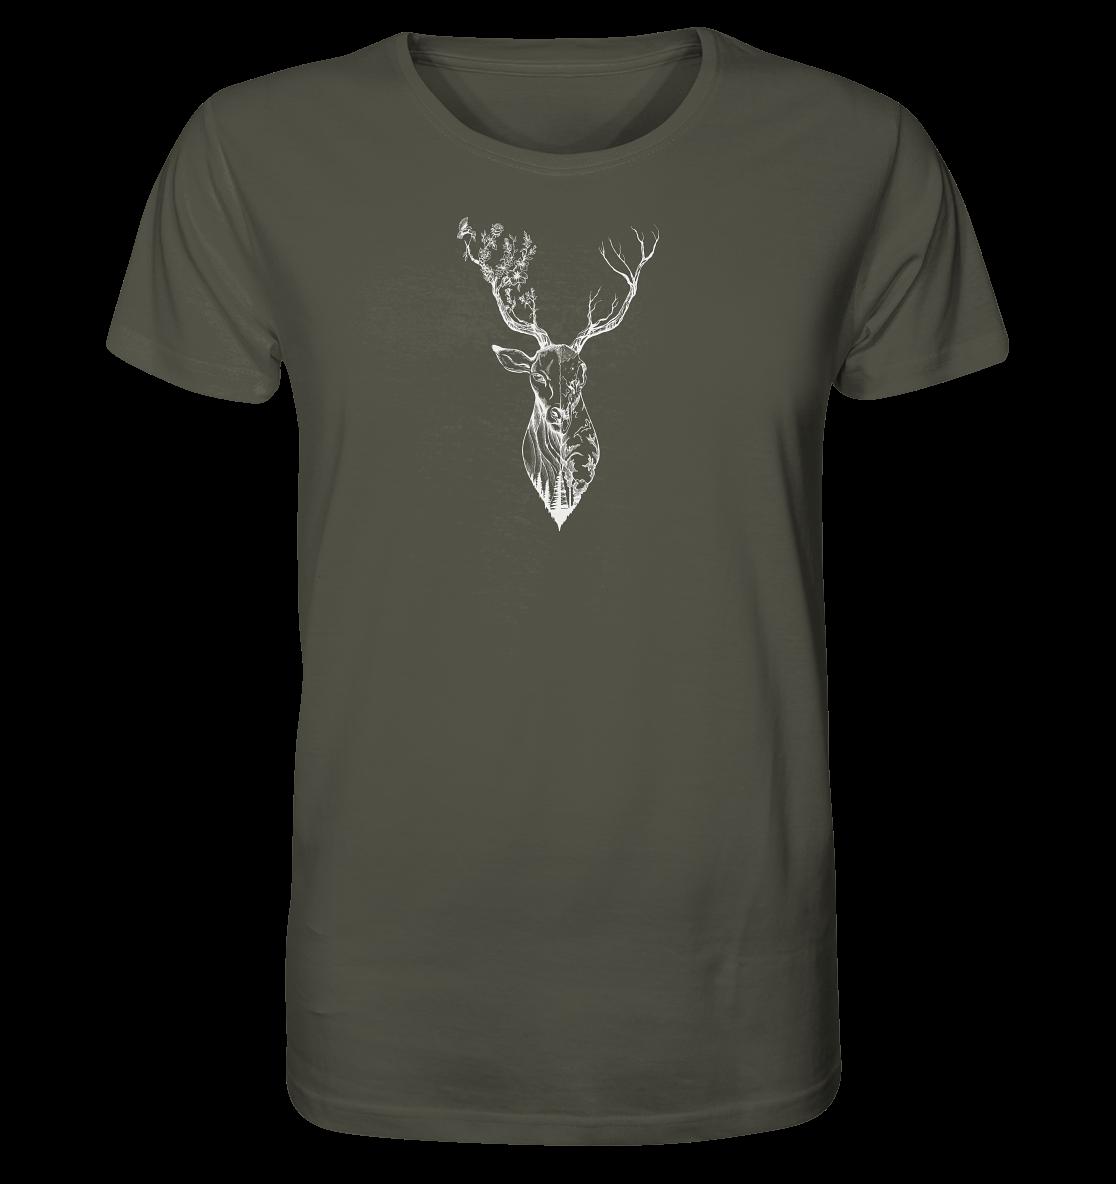 front-organic-shirt-545348-1116x-7.png